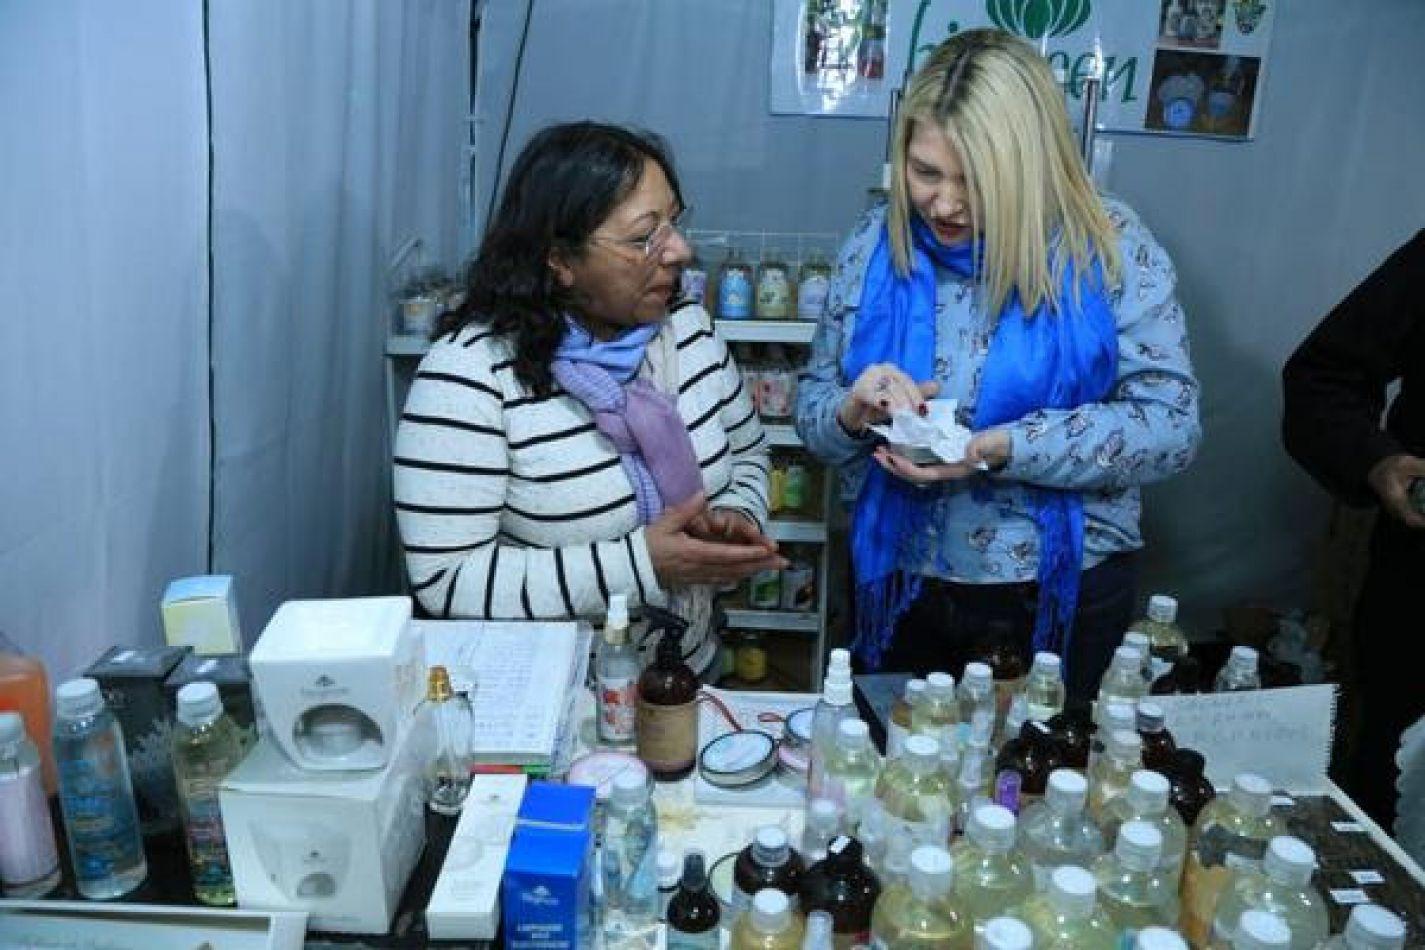 La gobernadora visitó la Expo Mercado Central